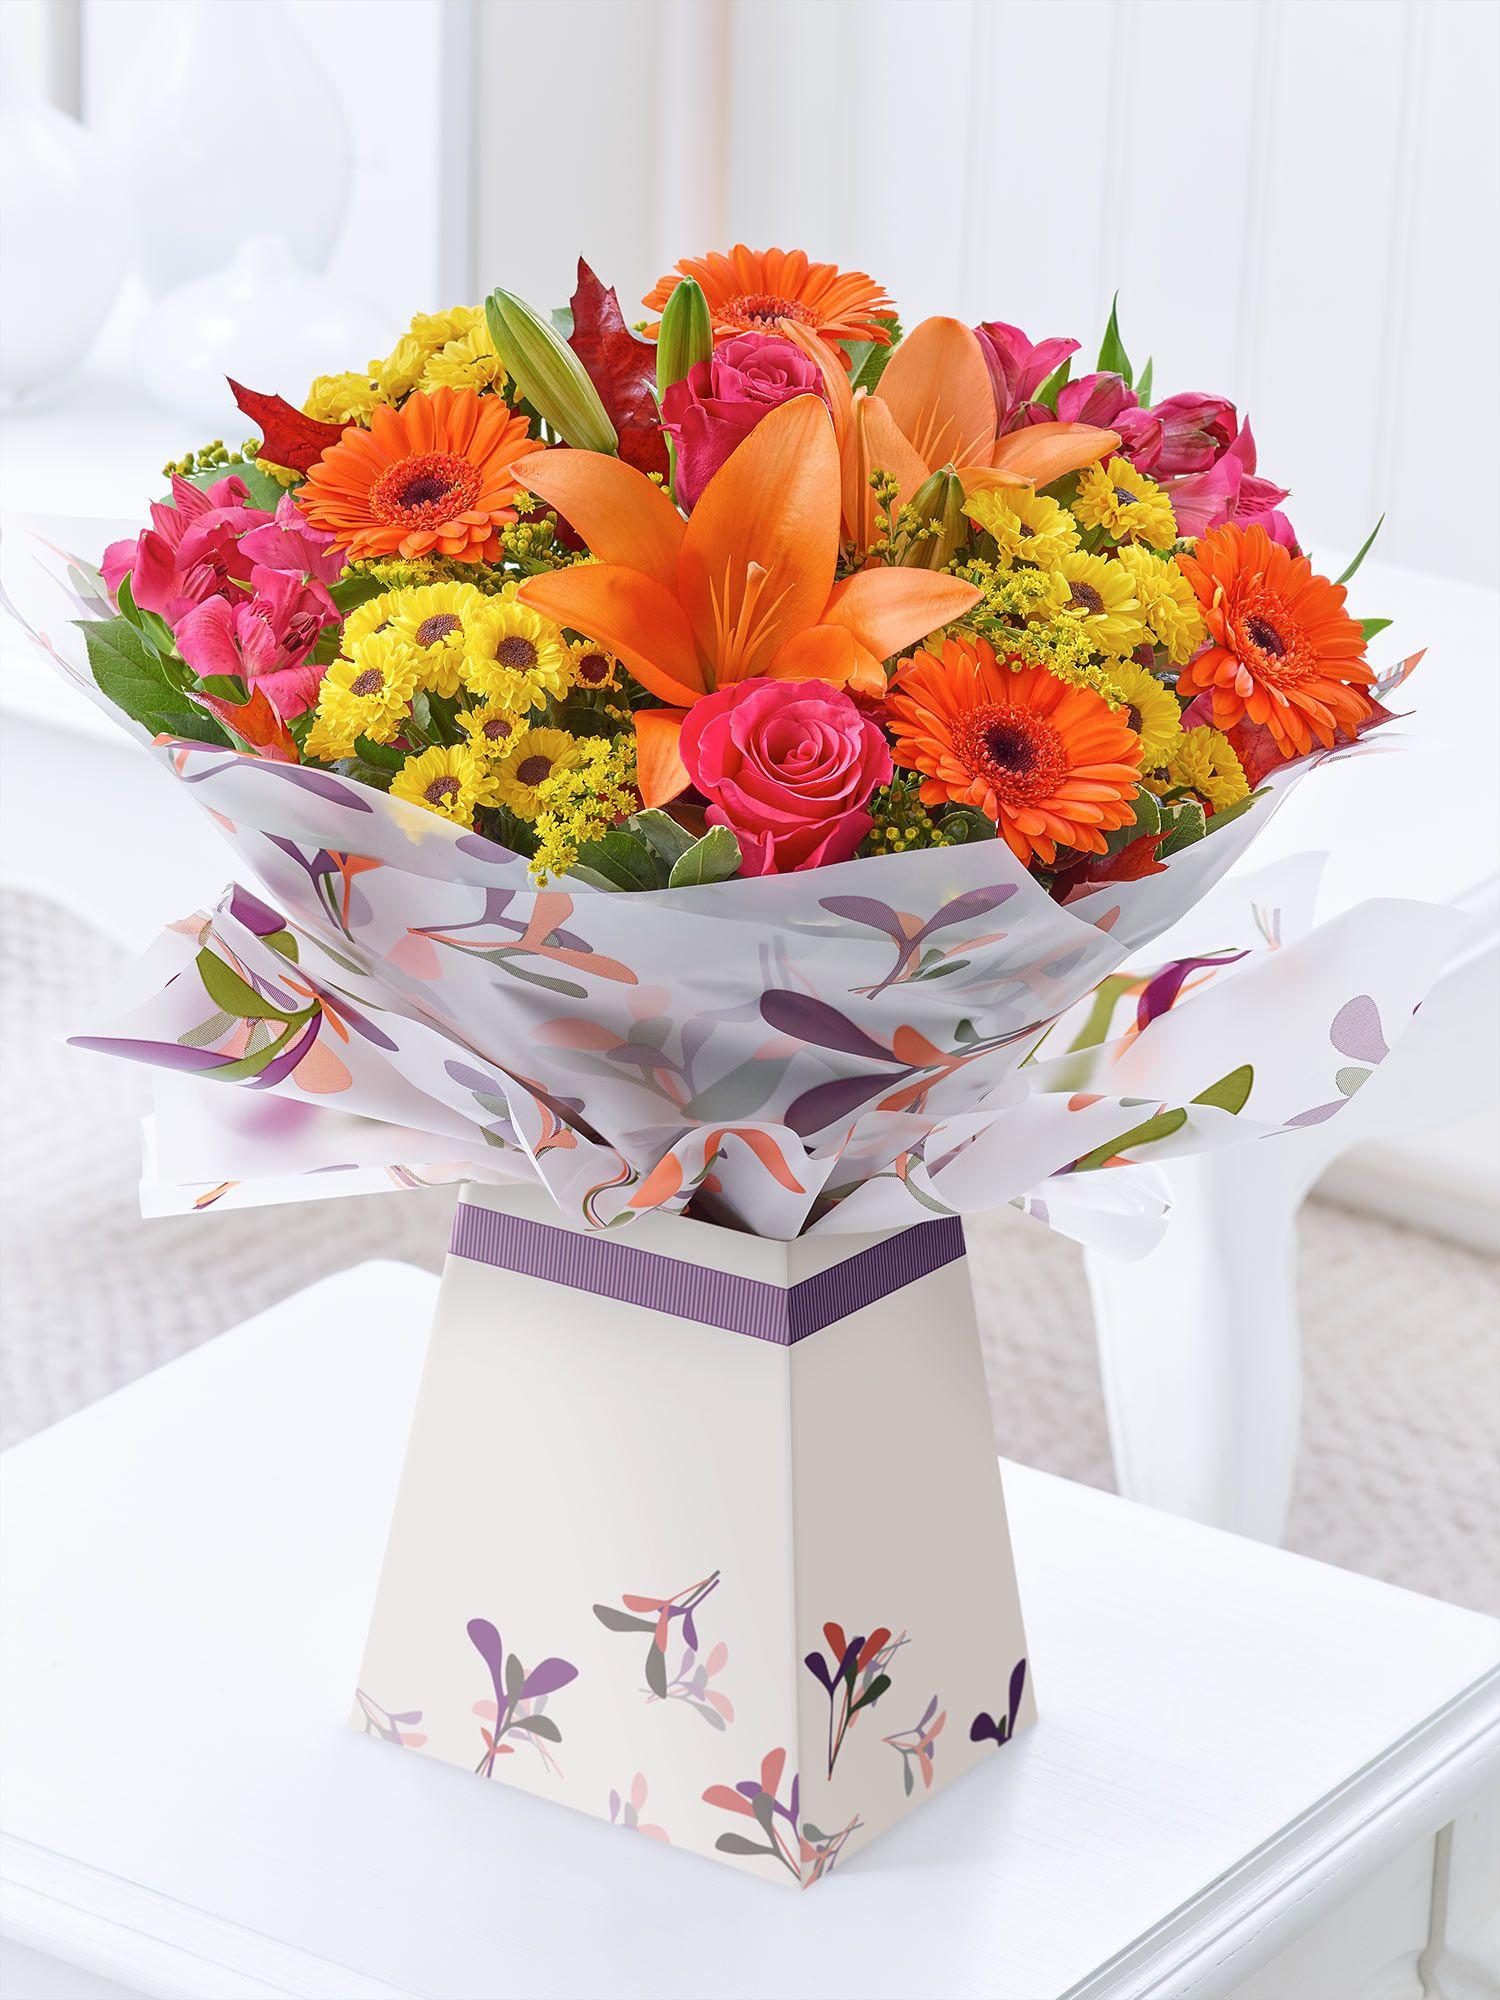 Cheer Box Vase Autumn Flowers Manchester Autumn Inspiration Design Autumn 2017 Boxing Fake Flower Arrangements